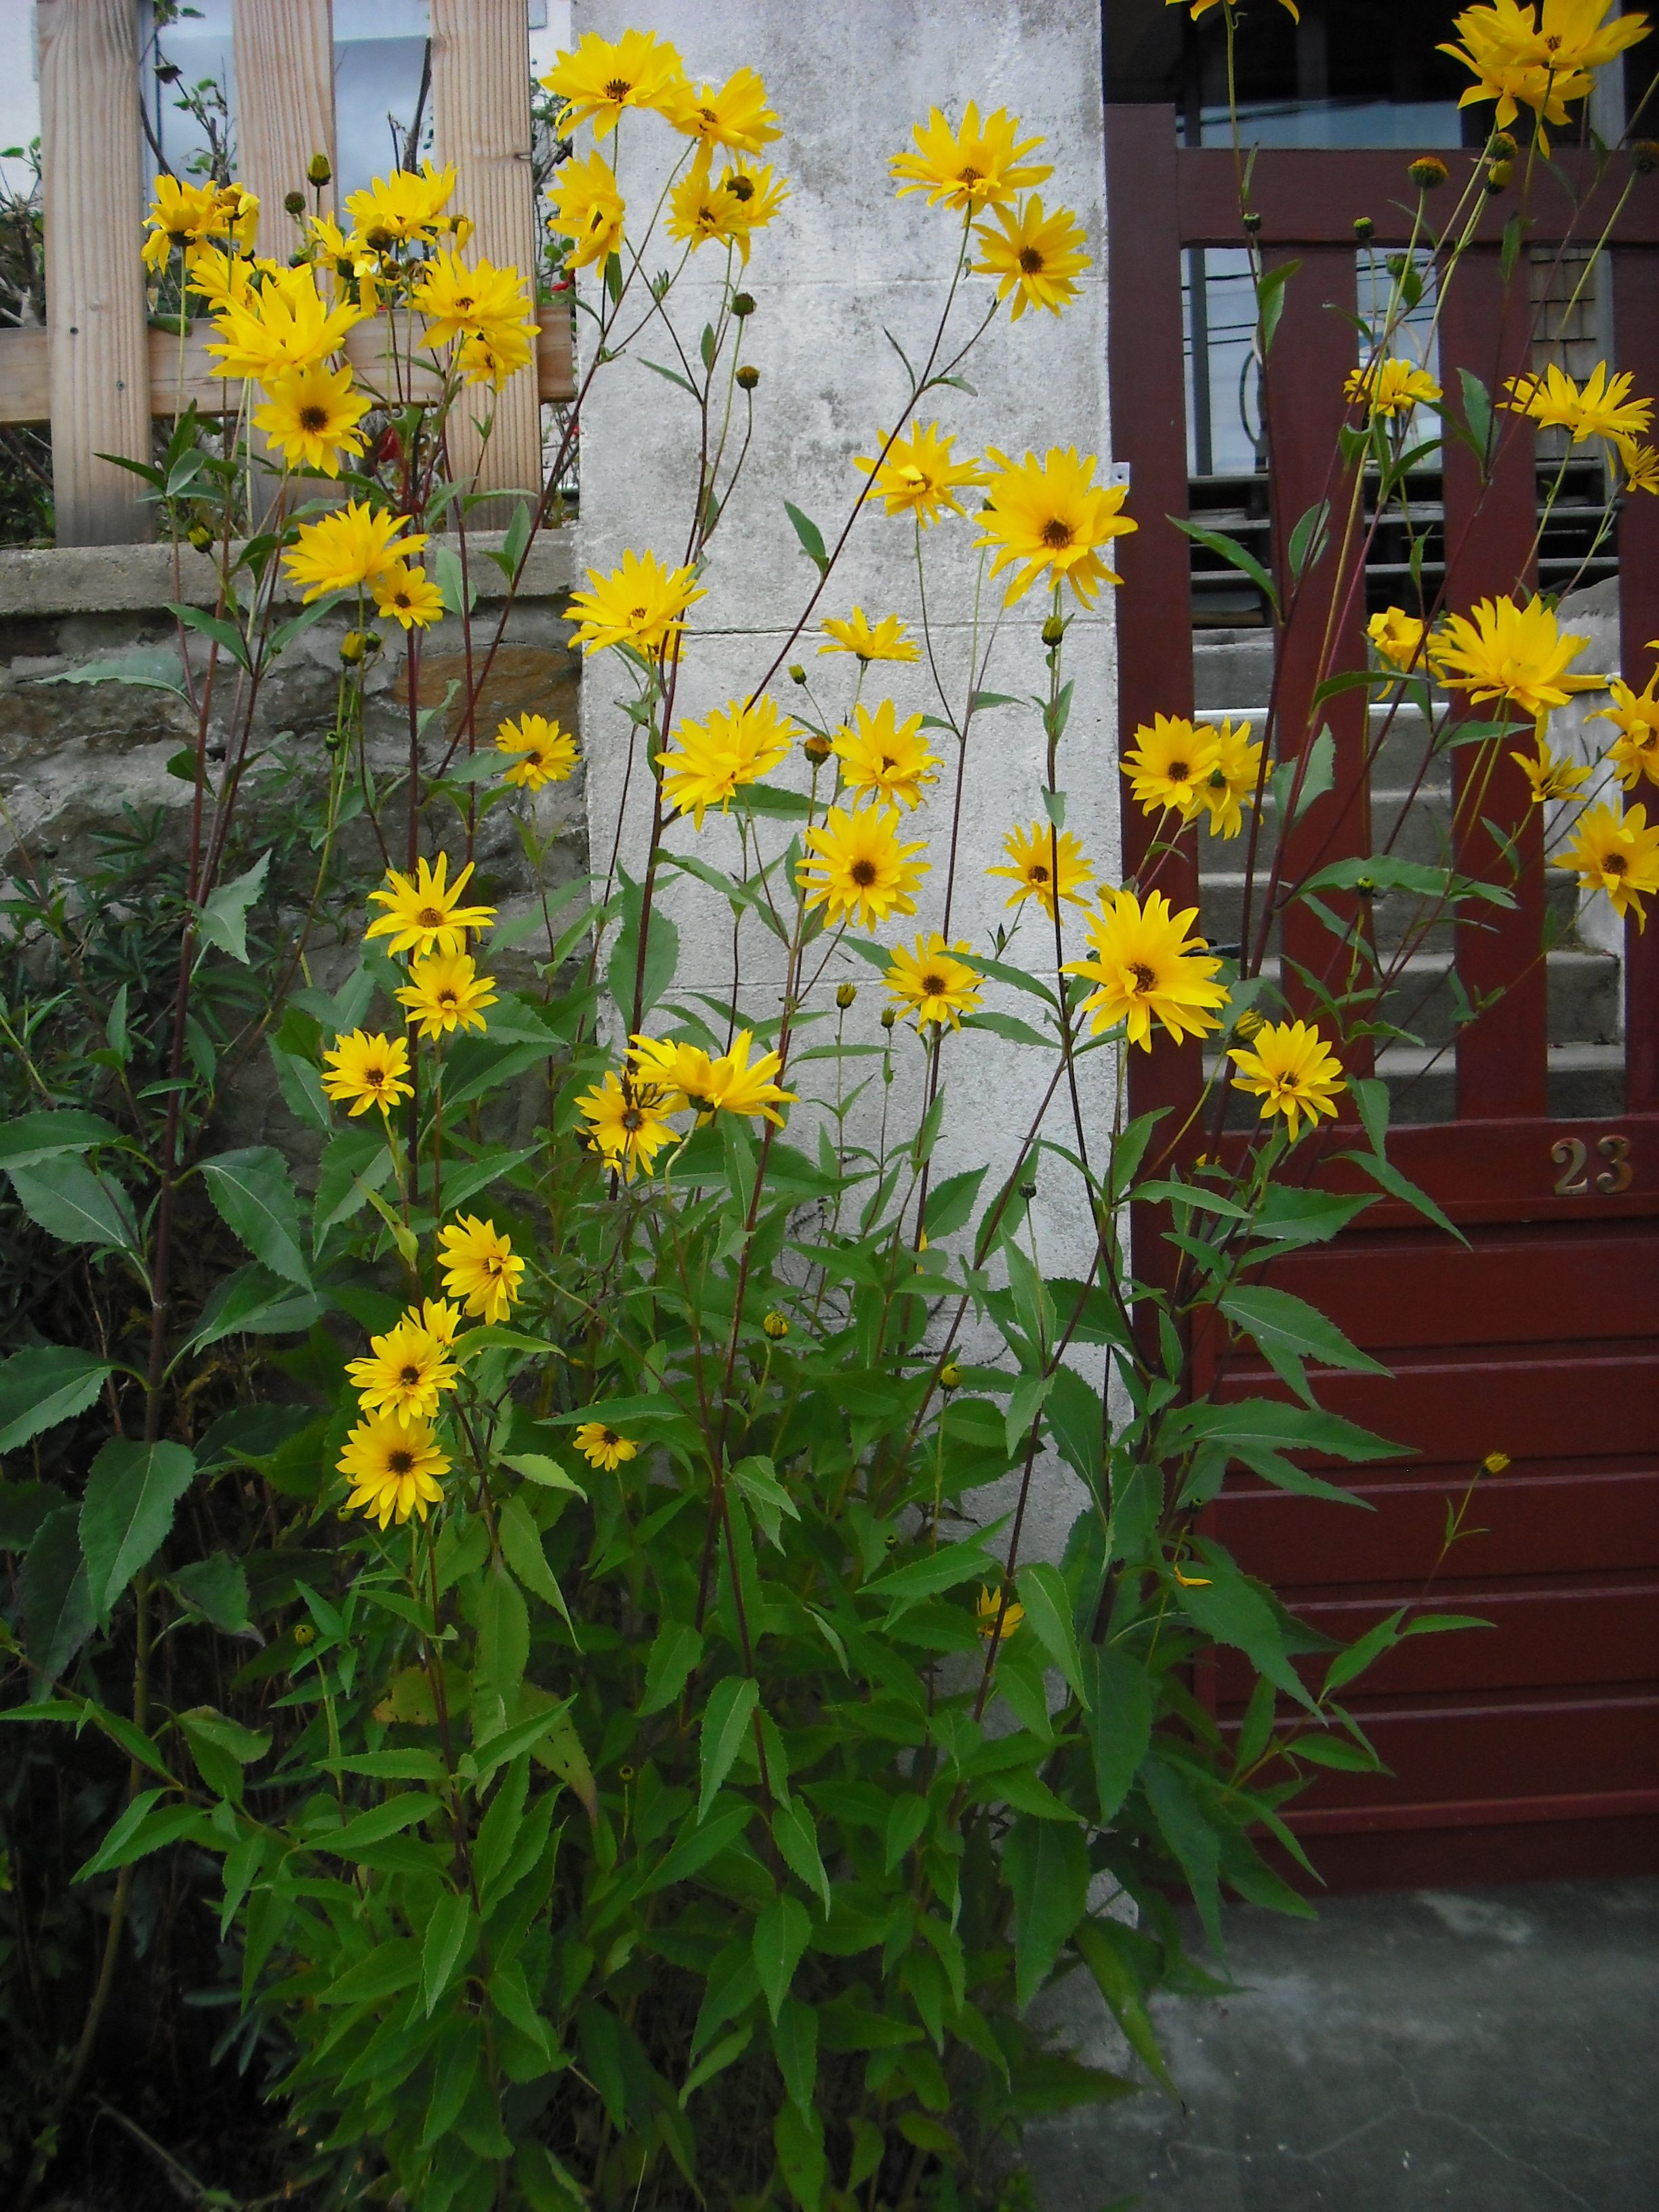 topinambour asteraceae helianthus toberosus plante vivace rustique tr s r sistante au froid. Black Bedroom Furniture Sets. Home Design Ideas